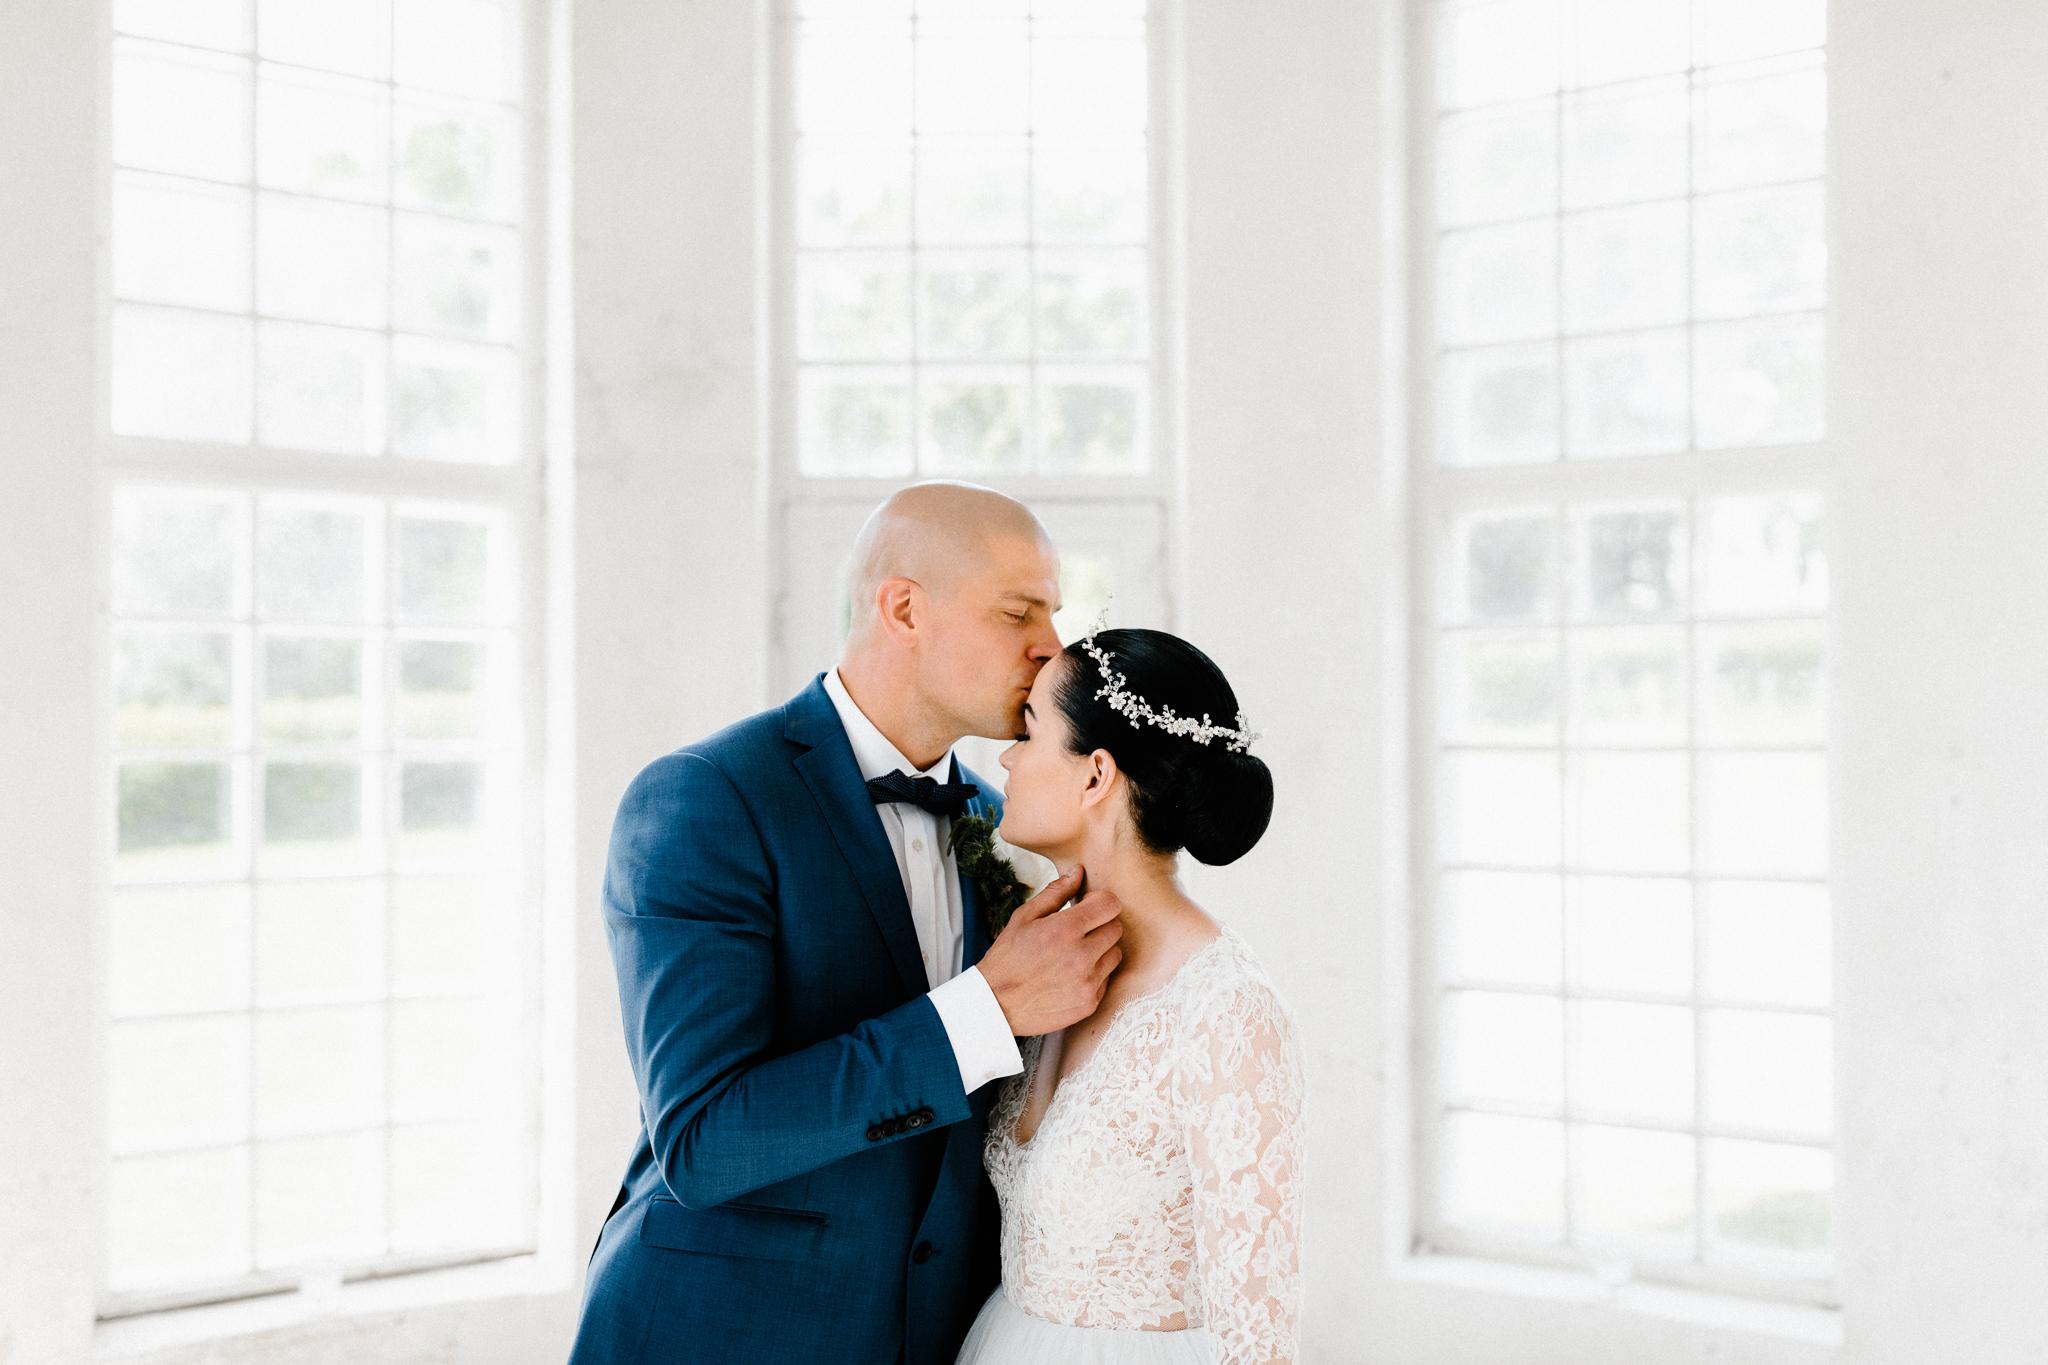 Essi + Ville   Oitbacka Gården   by Patrick Karkkolainen Wedding Photography-73.jpg